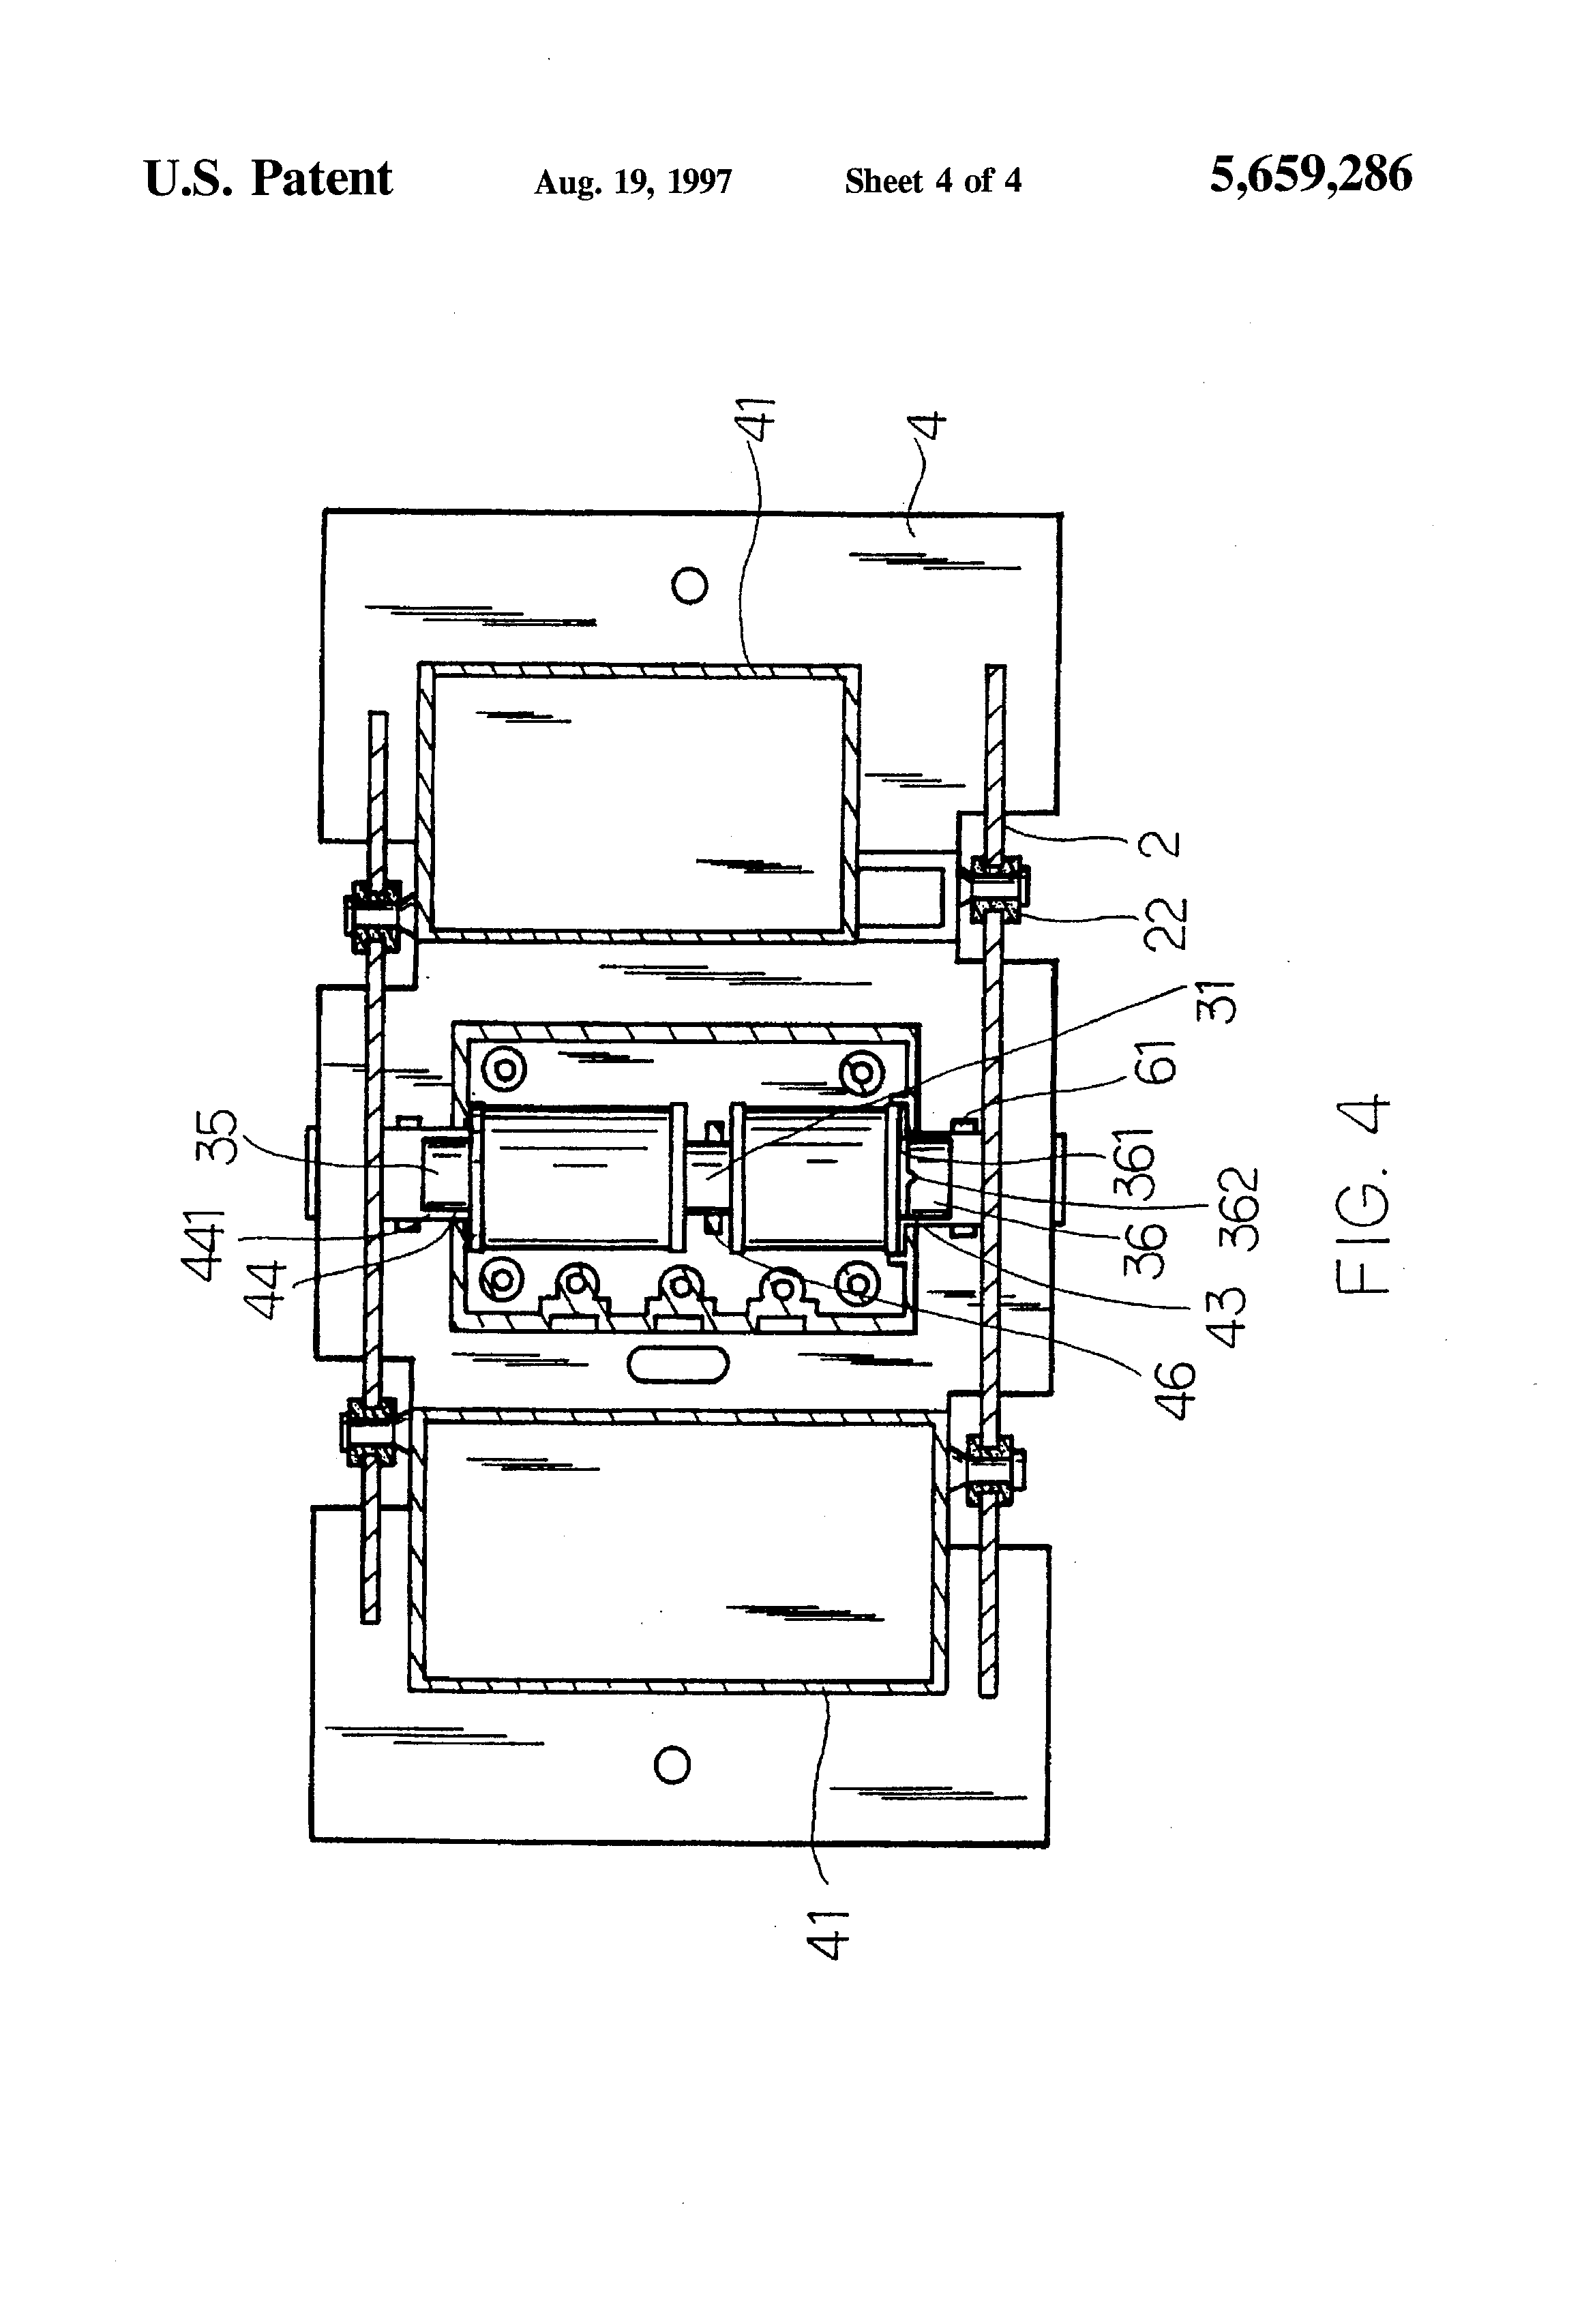 Old Friedland Doorbell Wiring Diagram Manual Guide